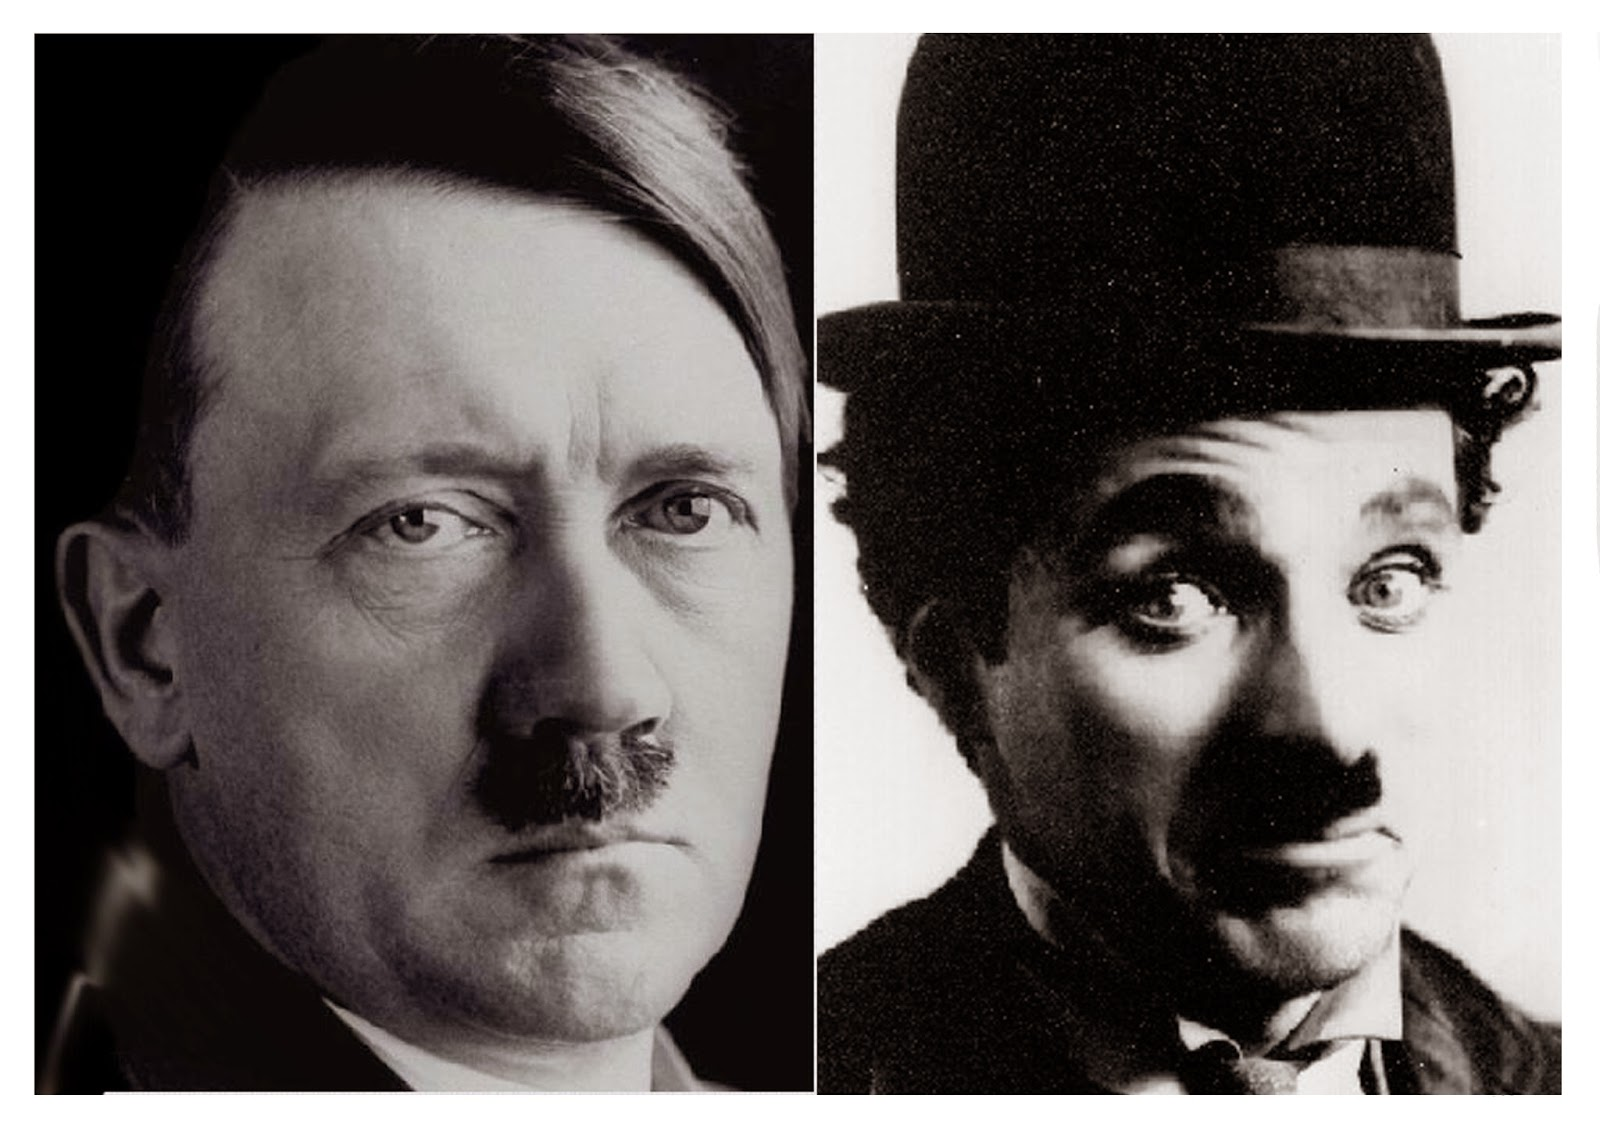 Charlie Chaplin and Adlof Hitler